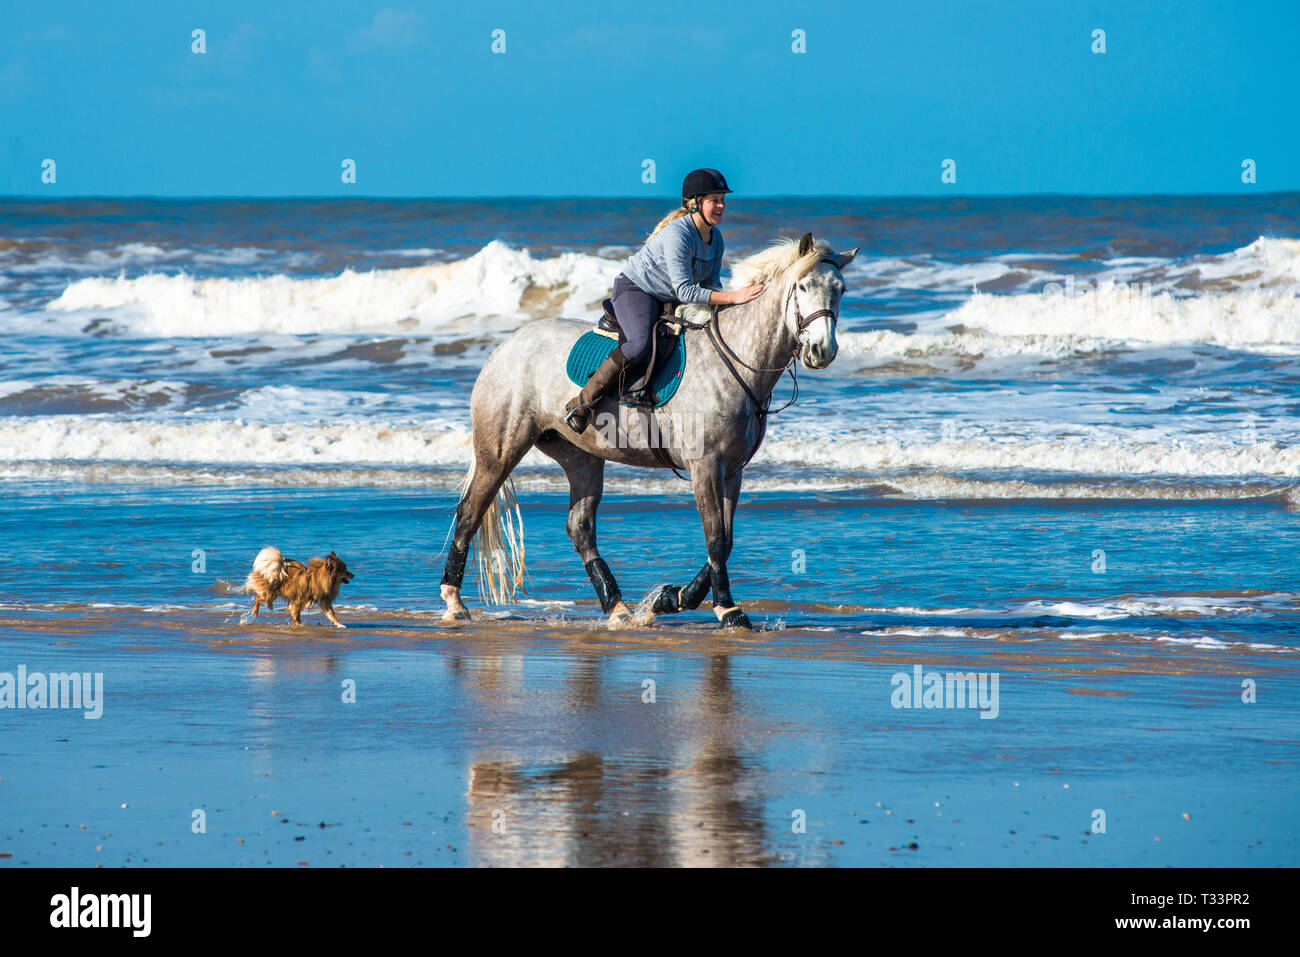 Horse and rider galloping on Holkham bay beach on North Nolfolk coast, East Anglia, England, UK. - Stock Image